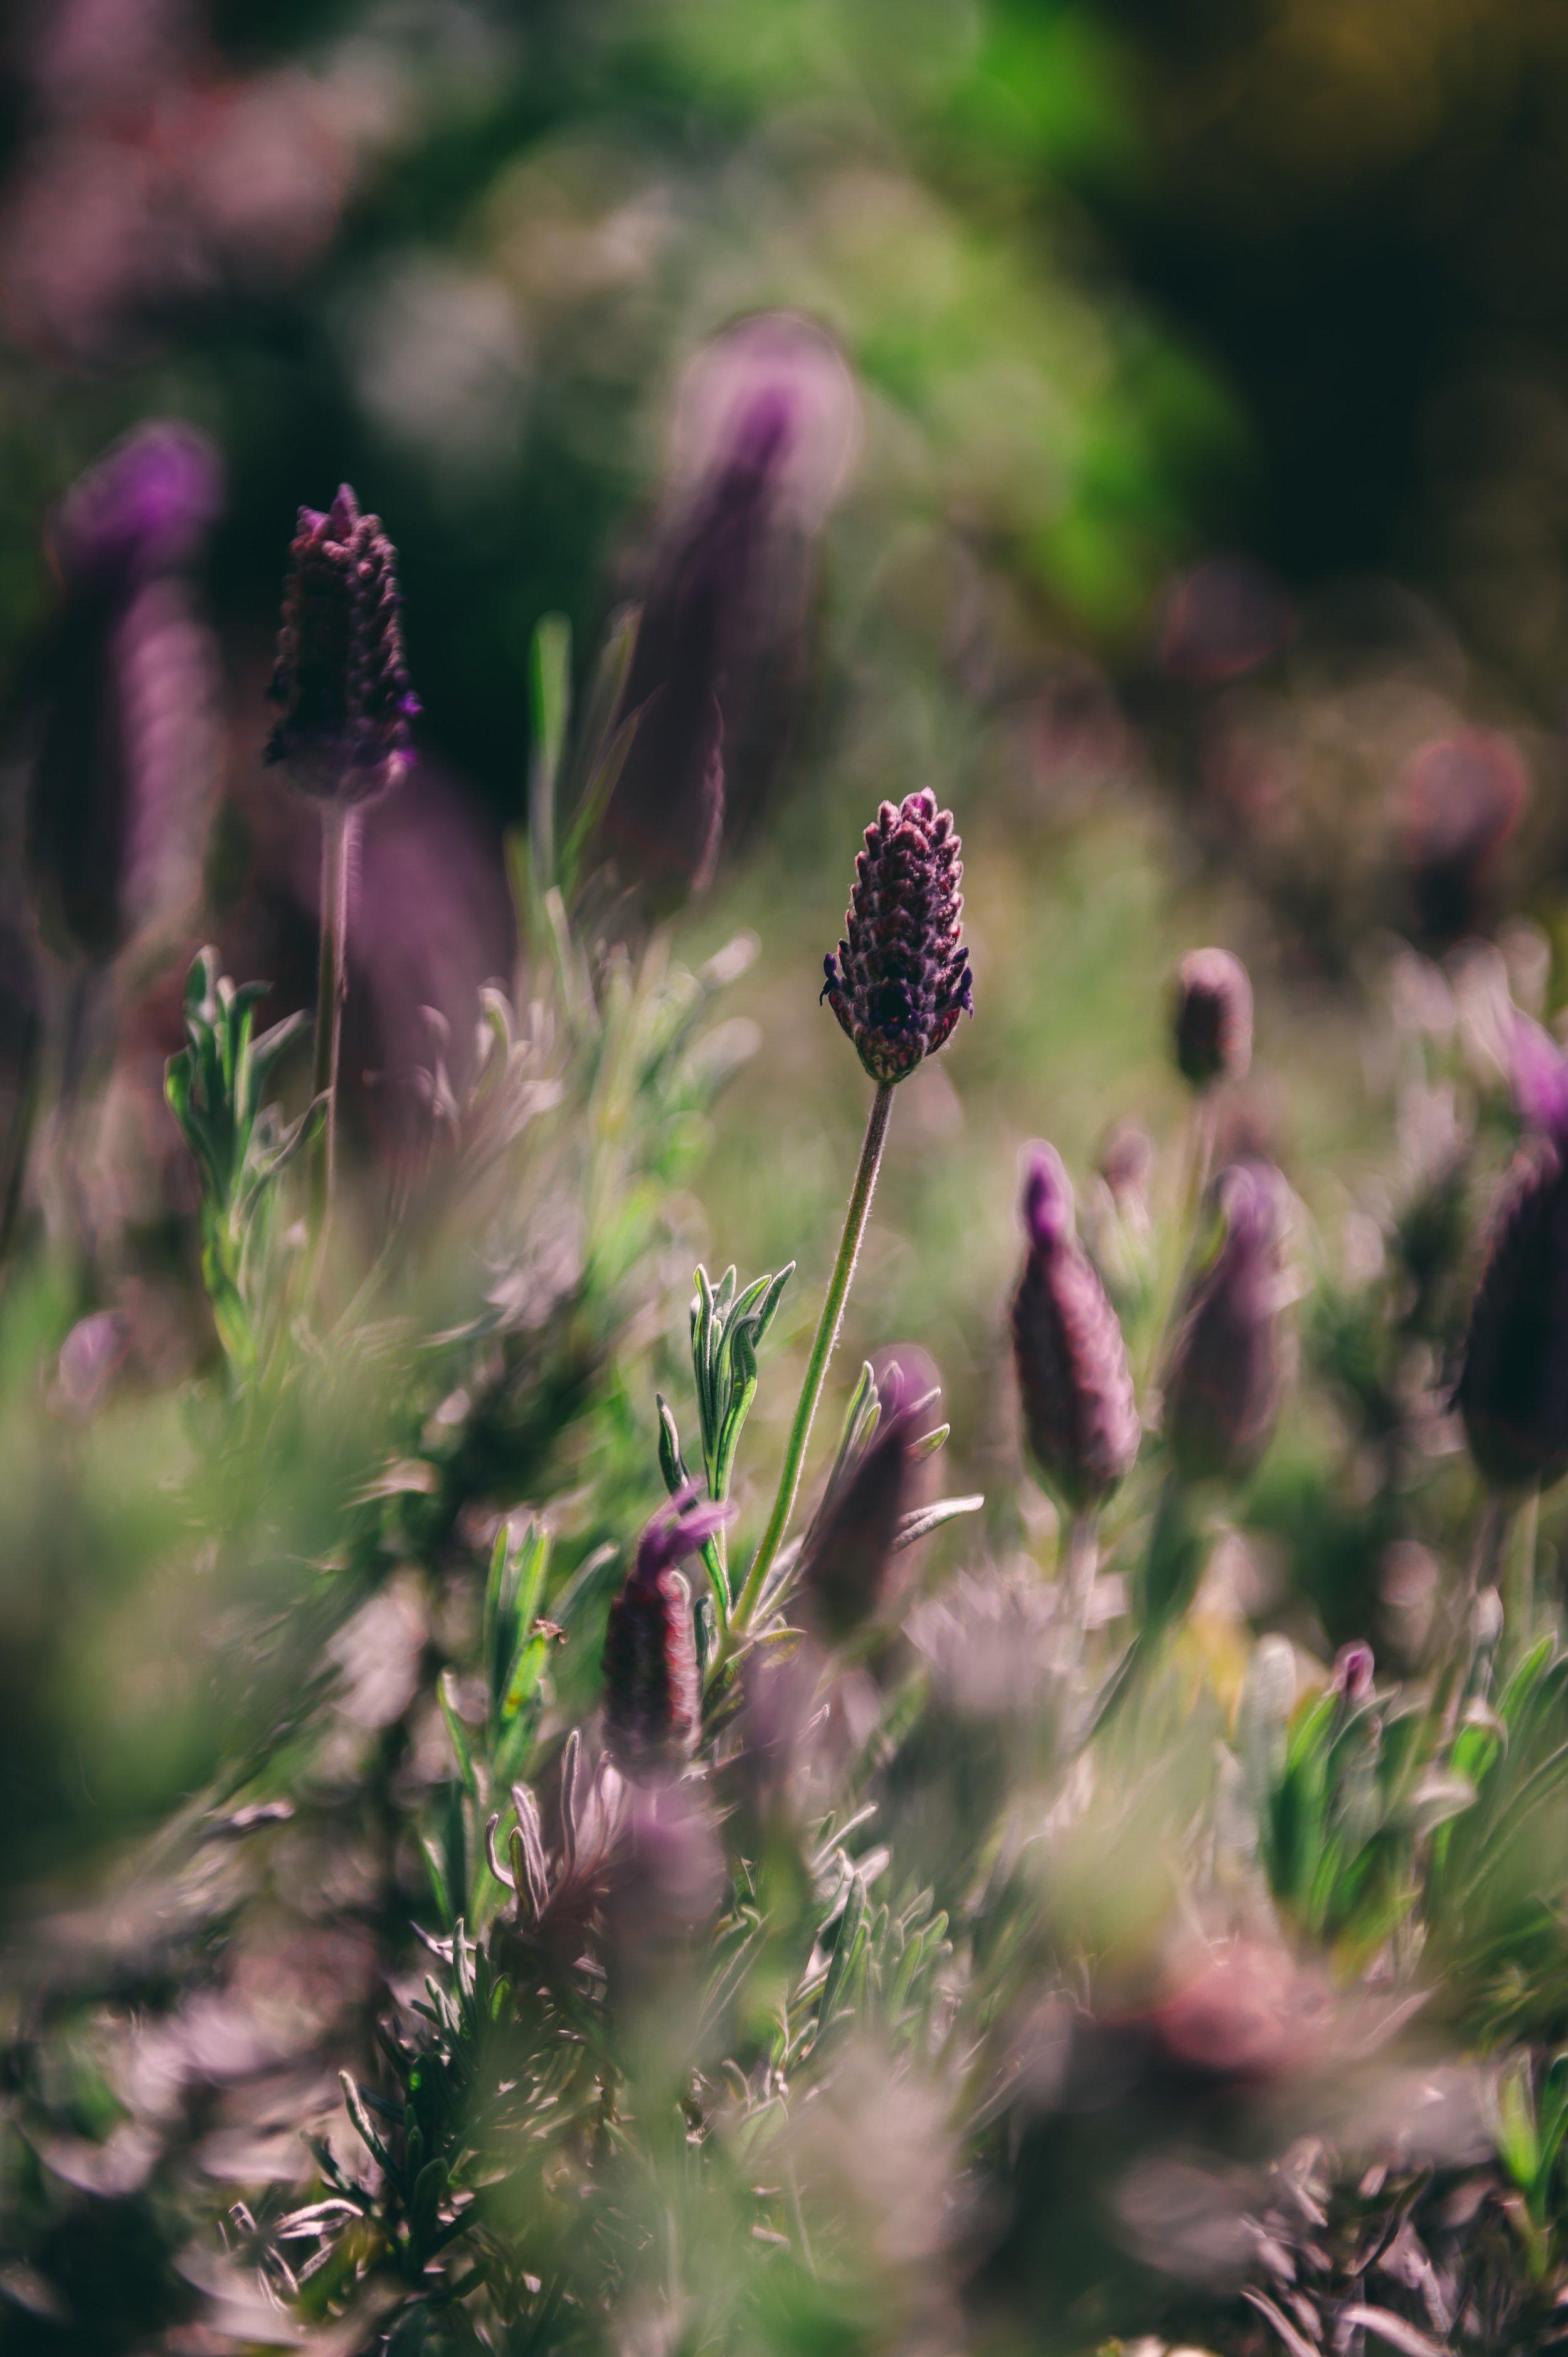 Stacy Wooster Apothecary spanish lavender flower herb _ pic from-elliot-banks-CFi8OllldJc-unsplash.jpg